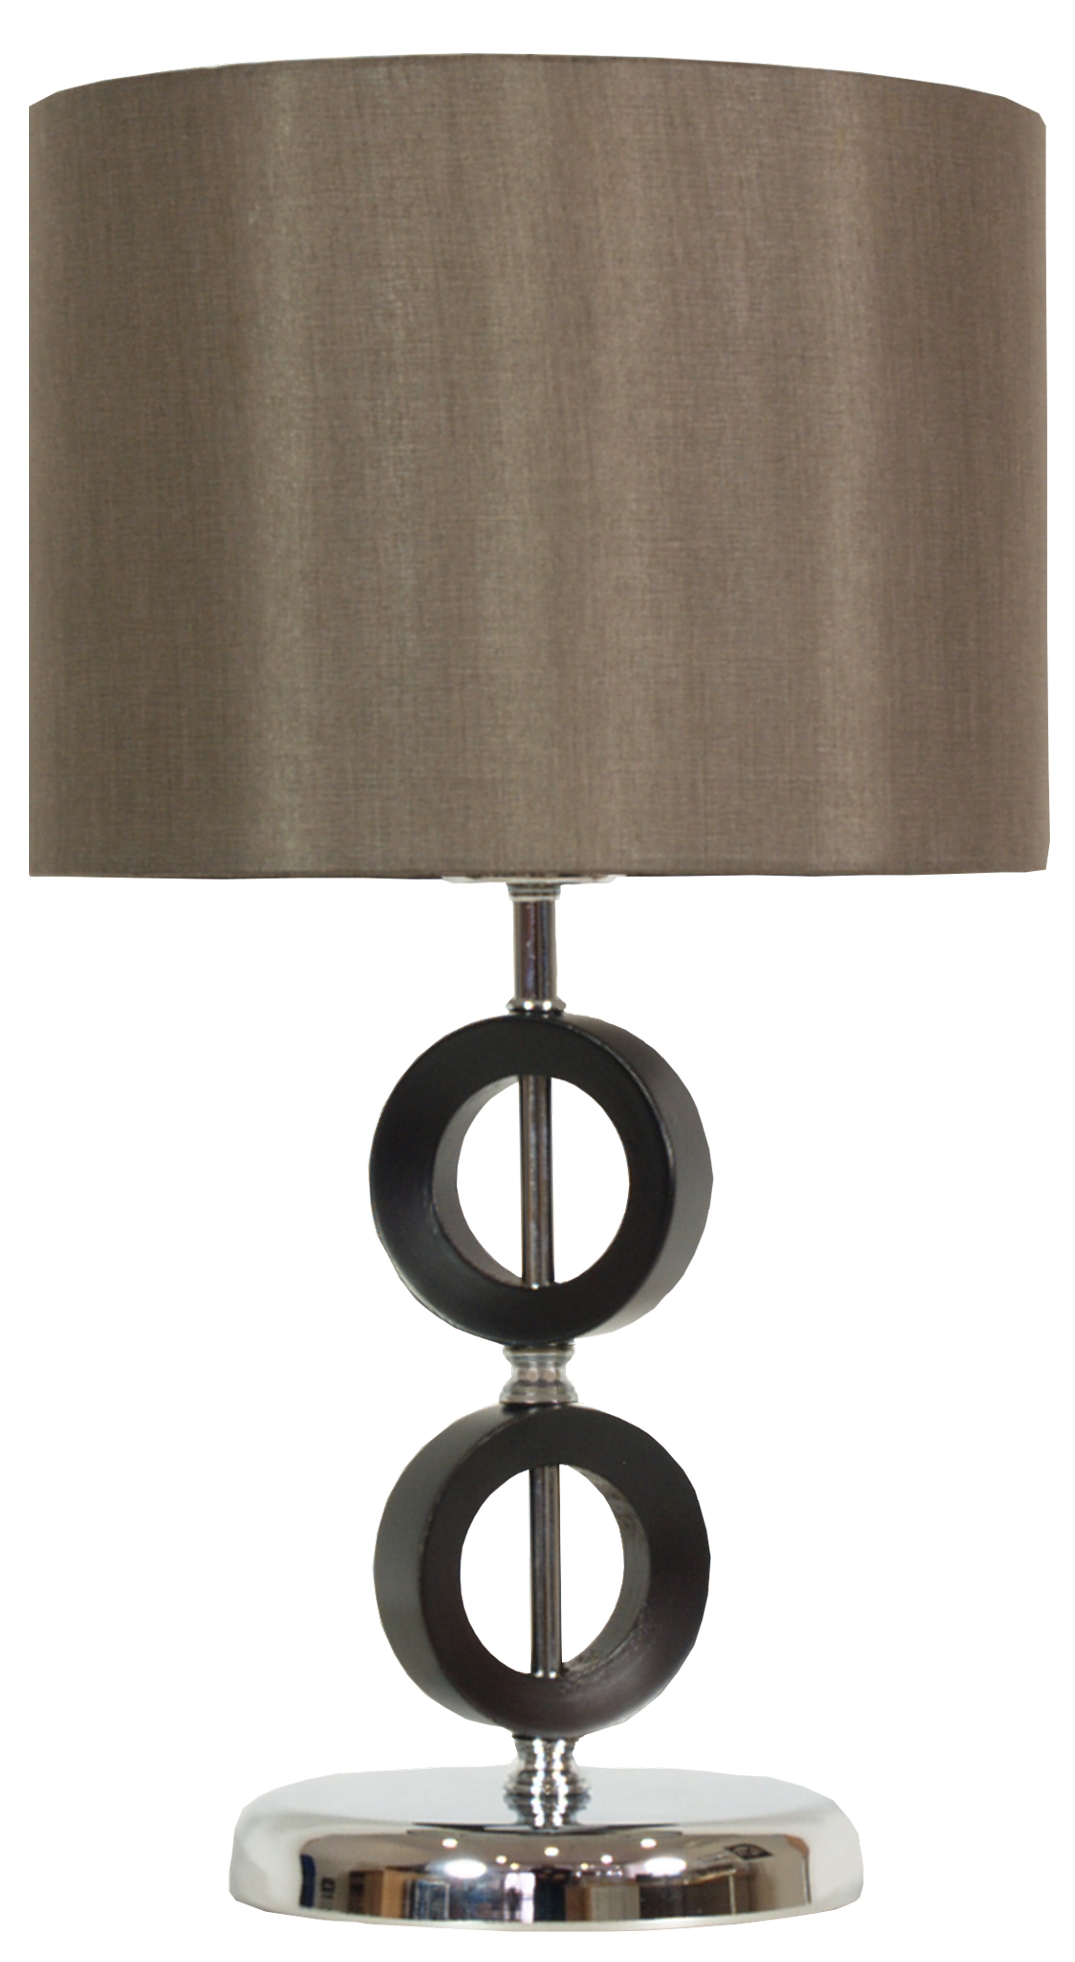 ANELLO LAMPA GABINETOWA 1X60W E27 H-43 BRĄZOWA - 41-01160